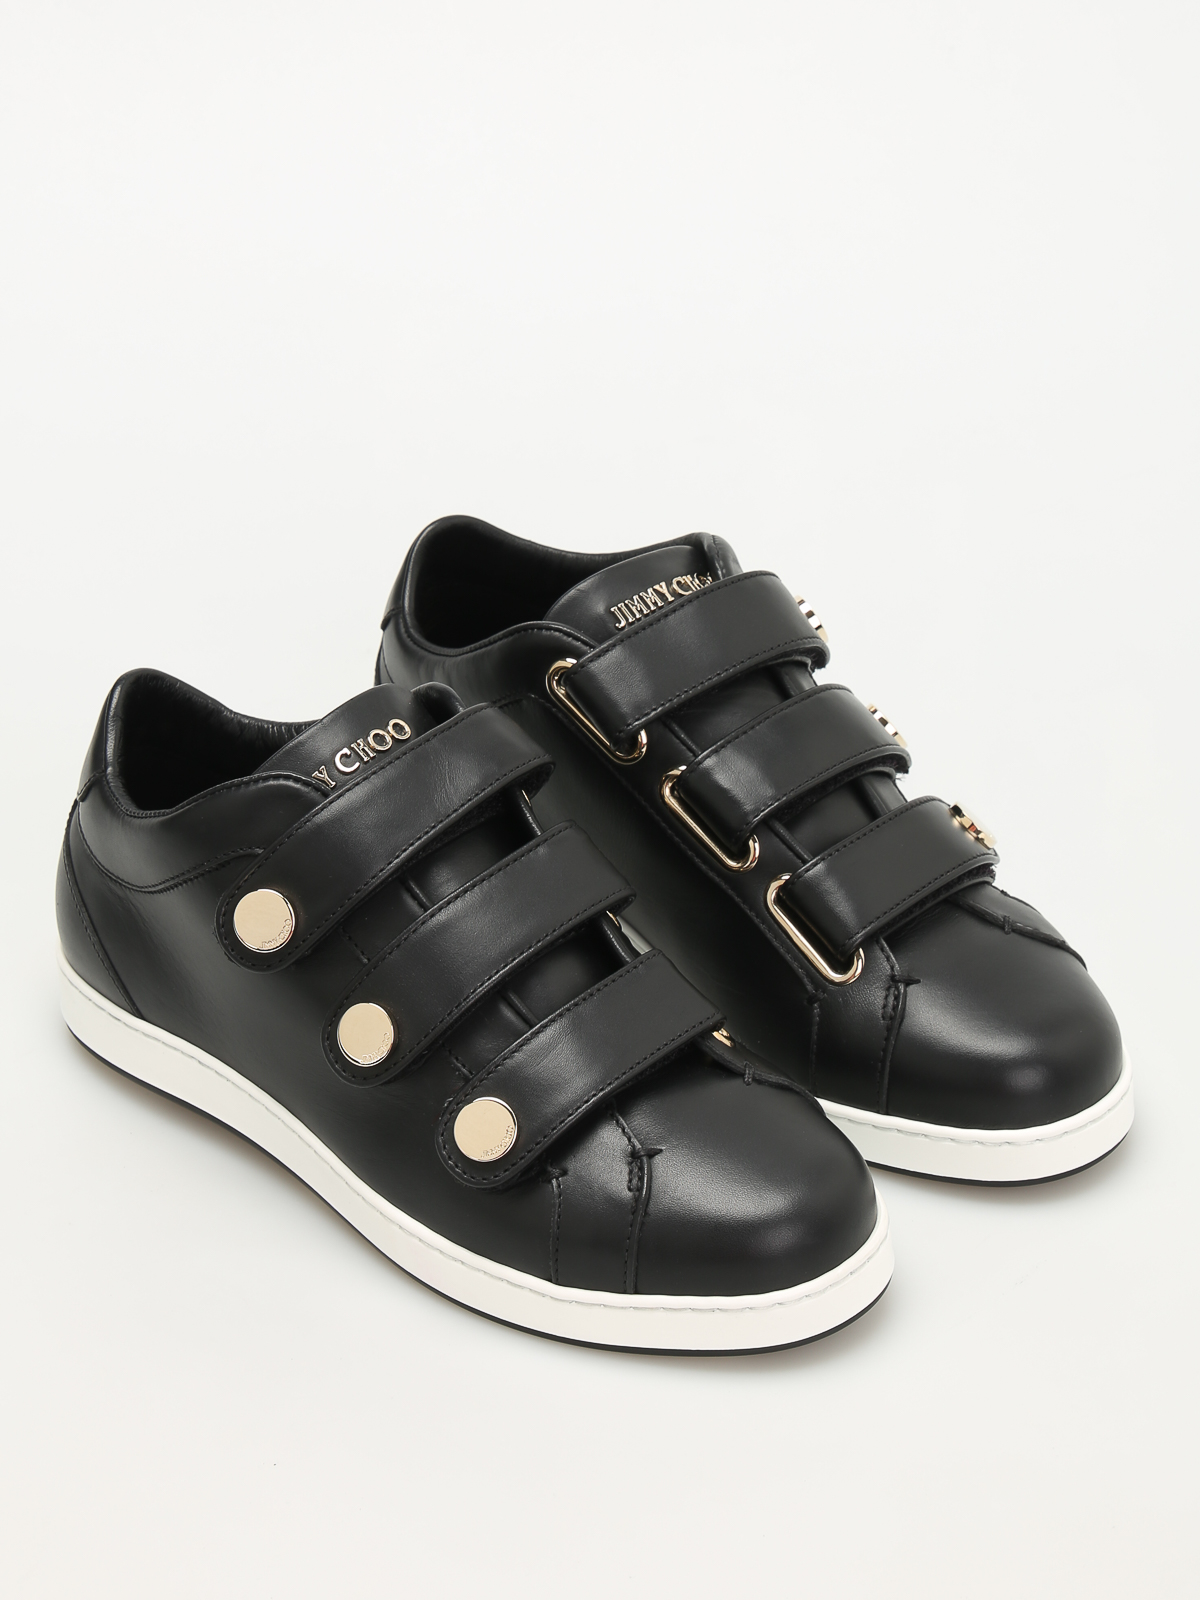 Chaussures De Sport Jimmy Choo Ny - Noir 8lYD8wte